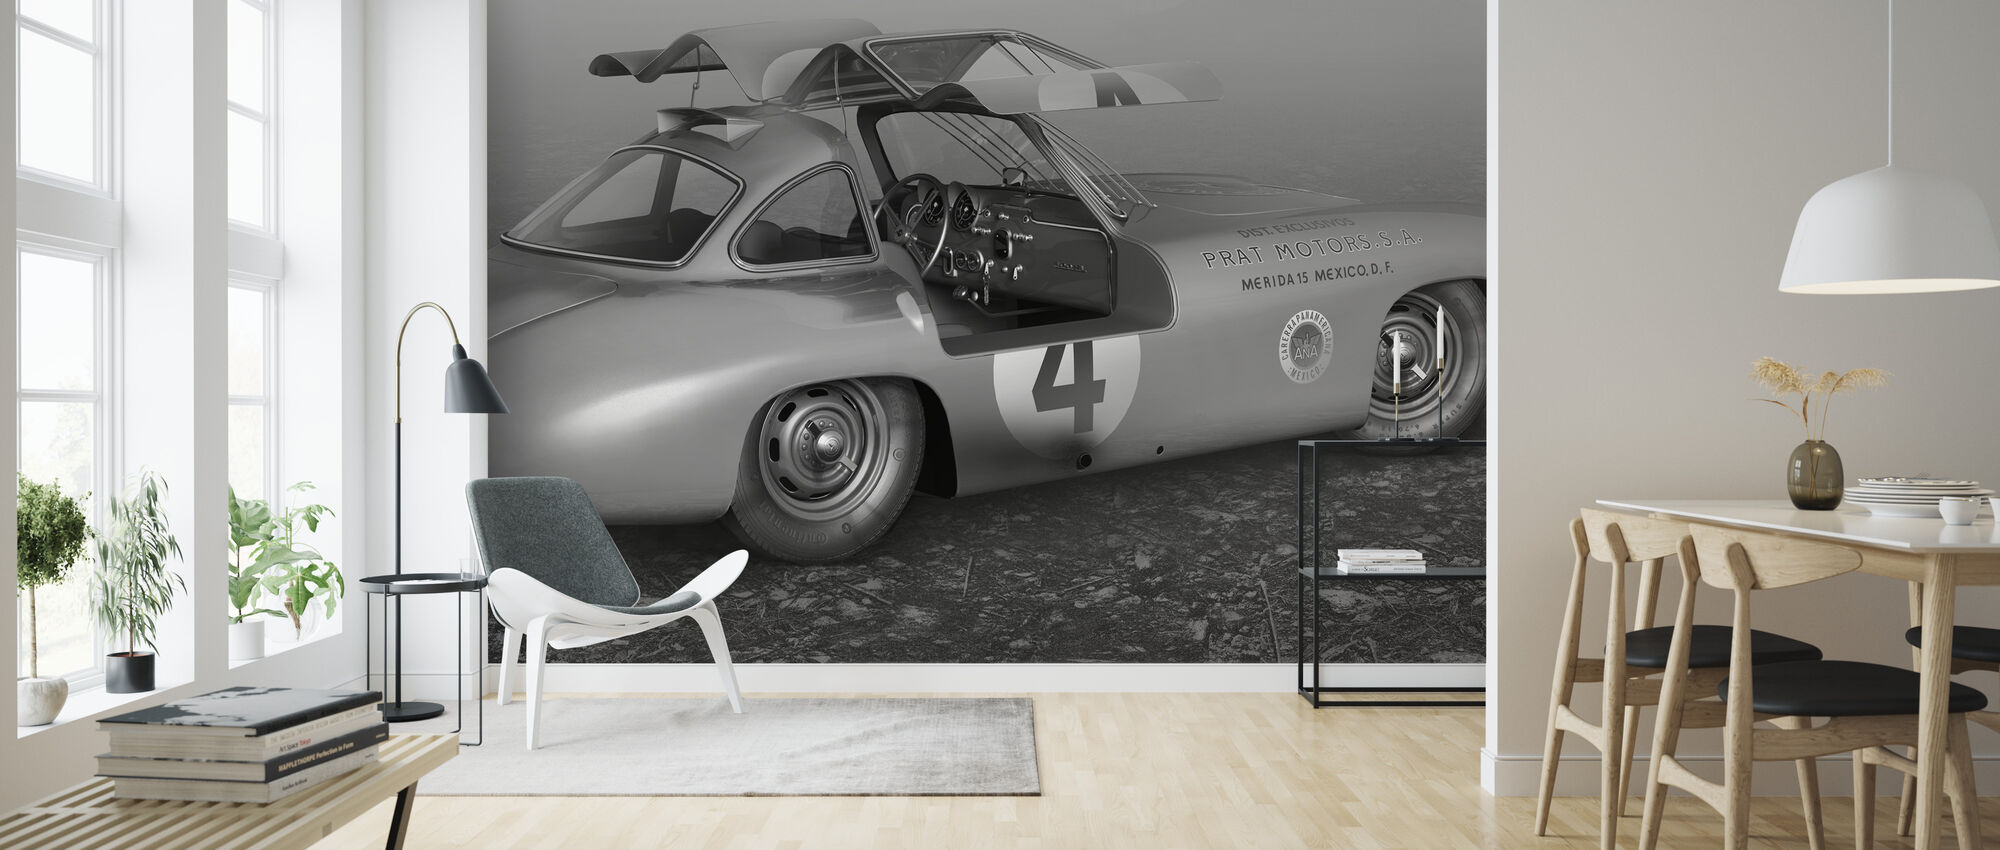 C Panamericana BW - Wallpaper - Living Room